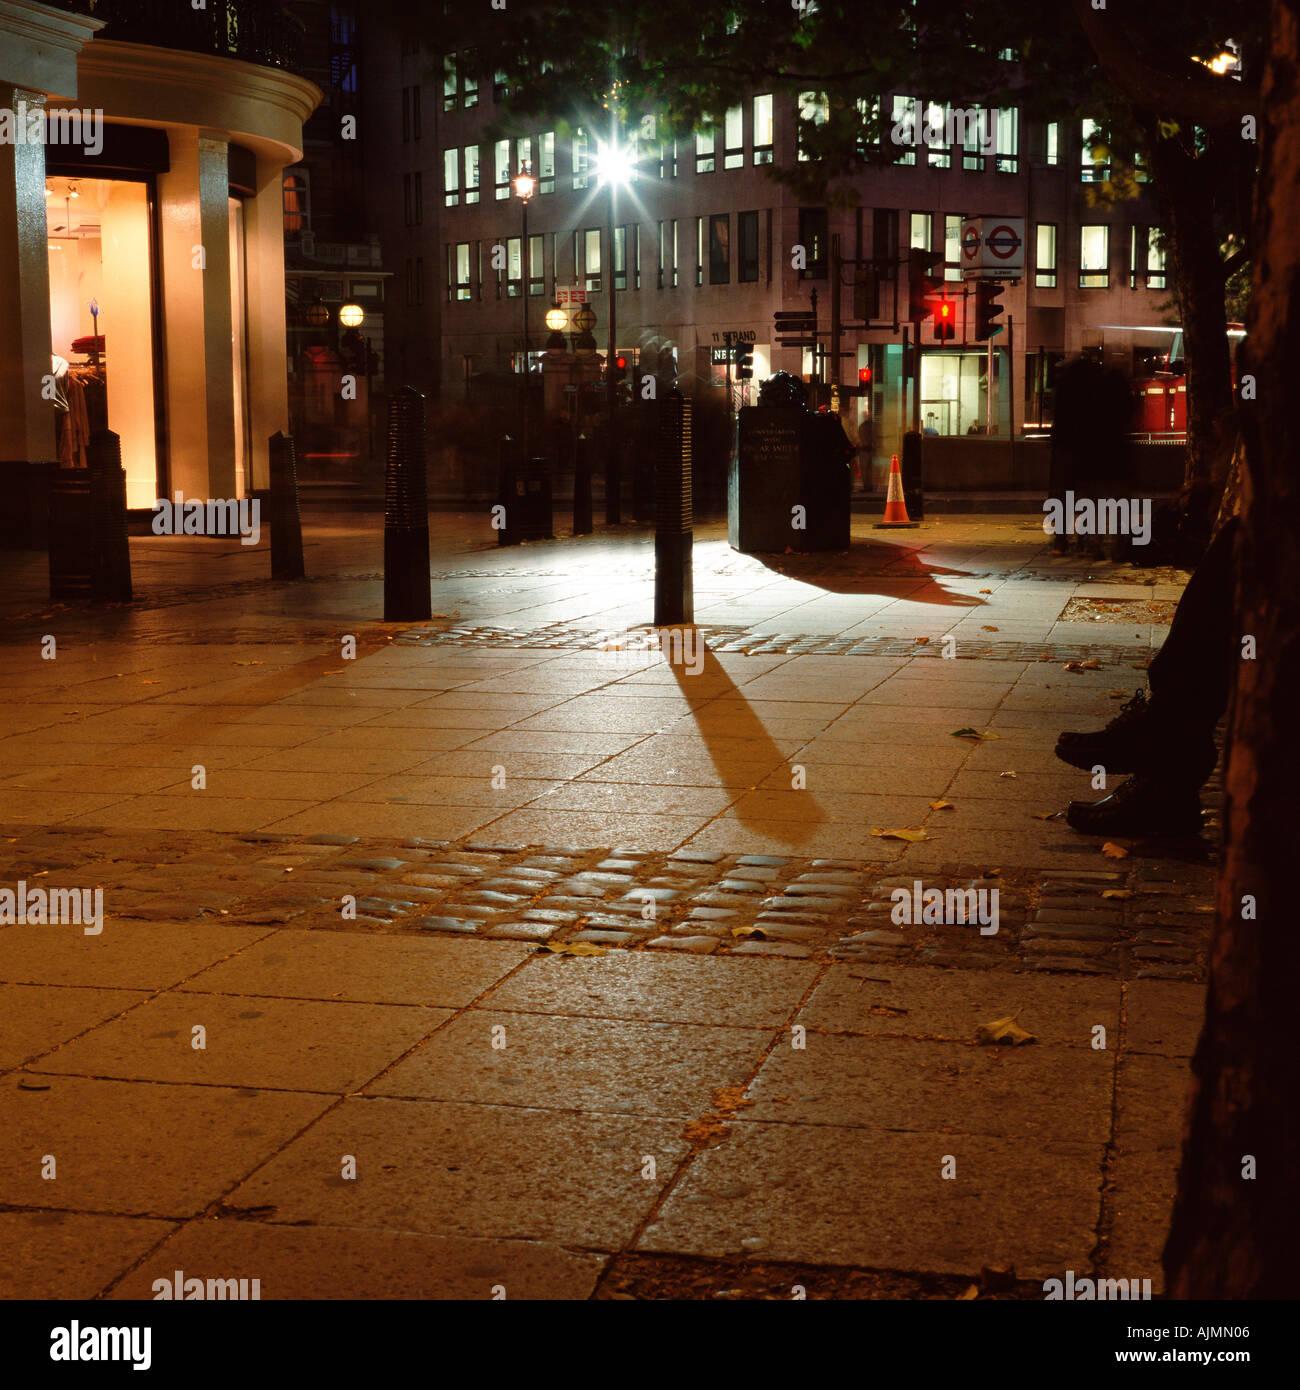 Illuminated street at night - Stock Image